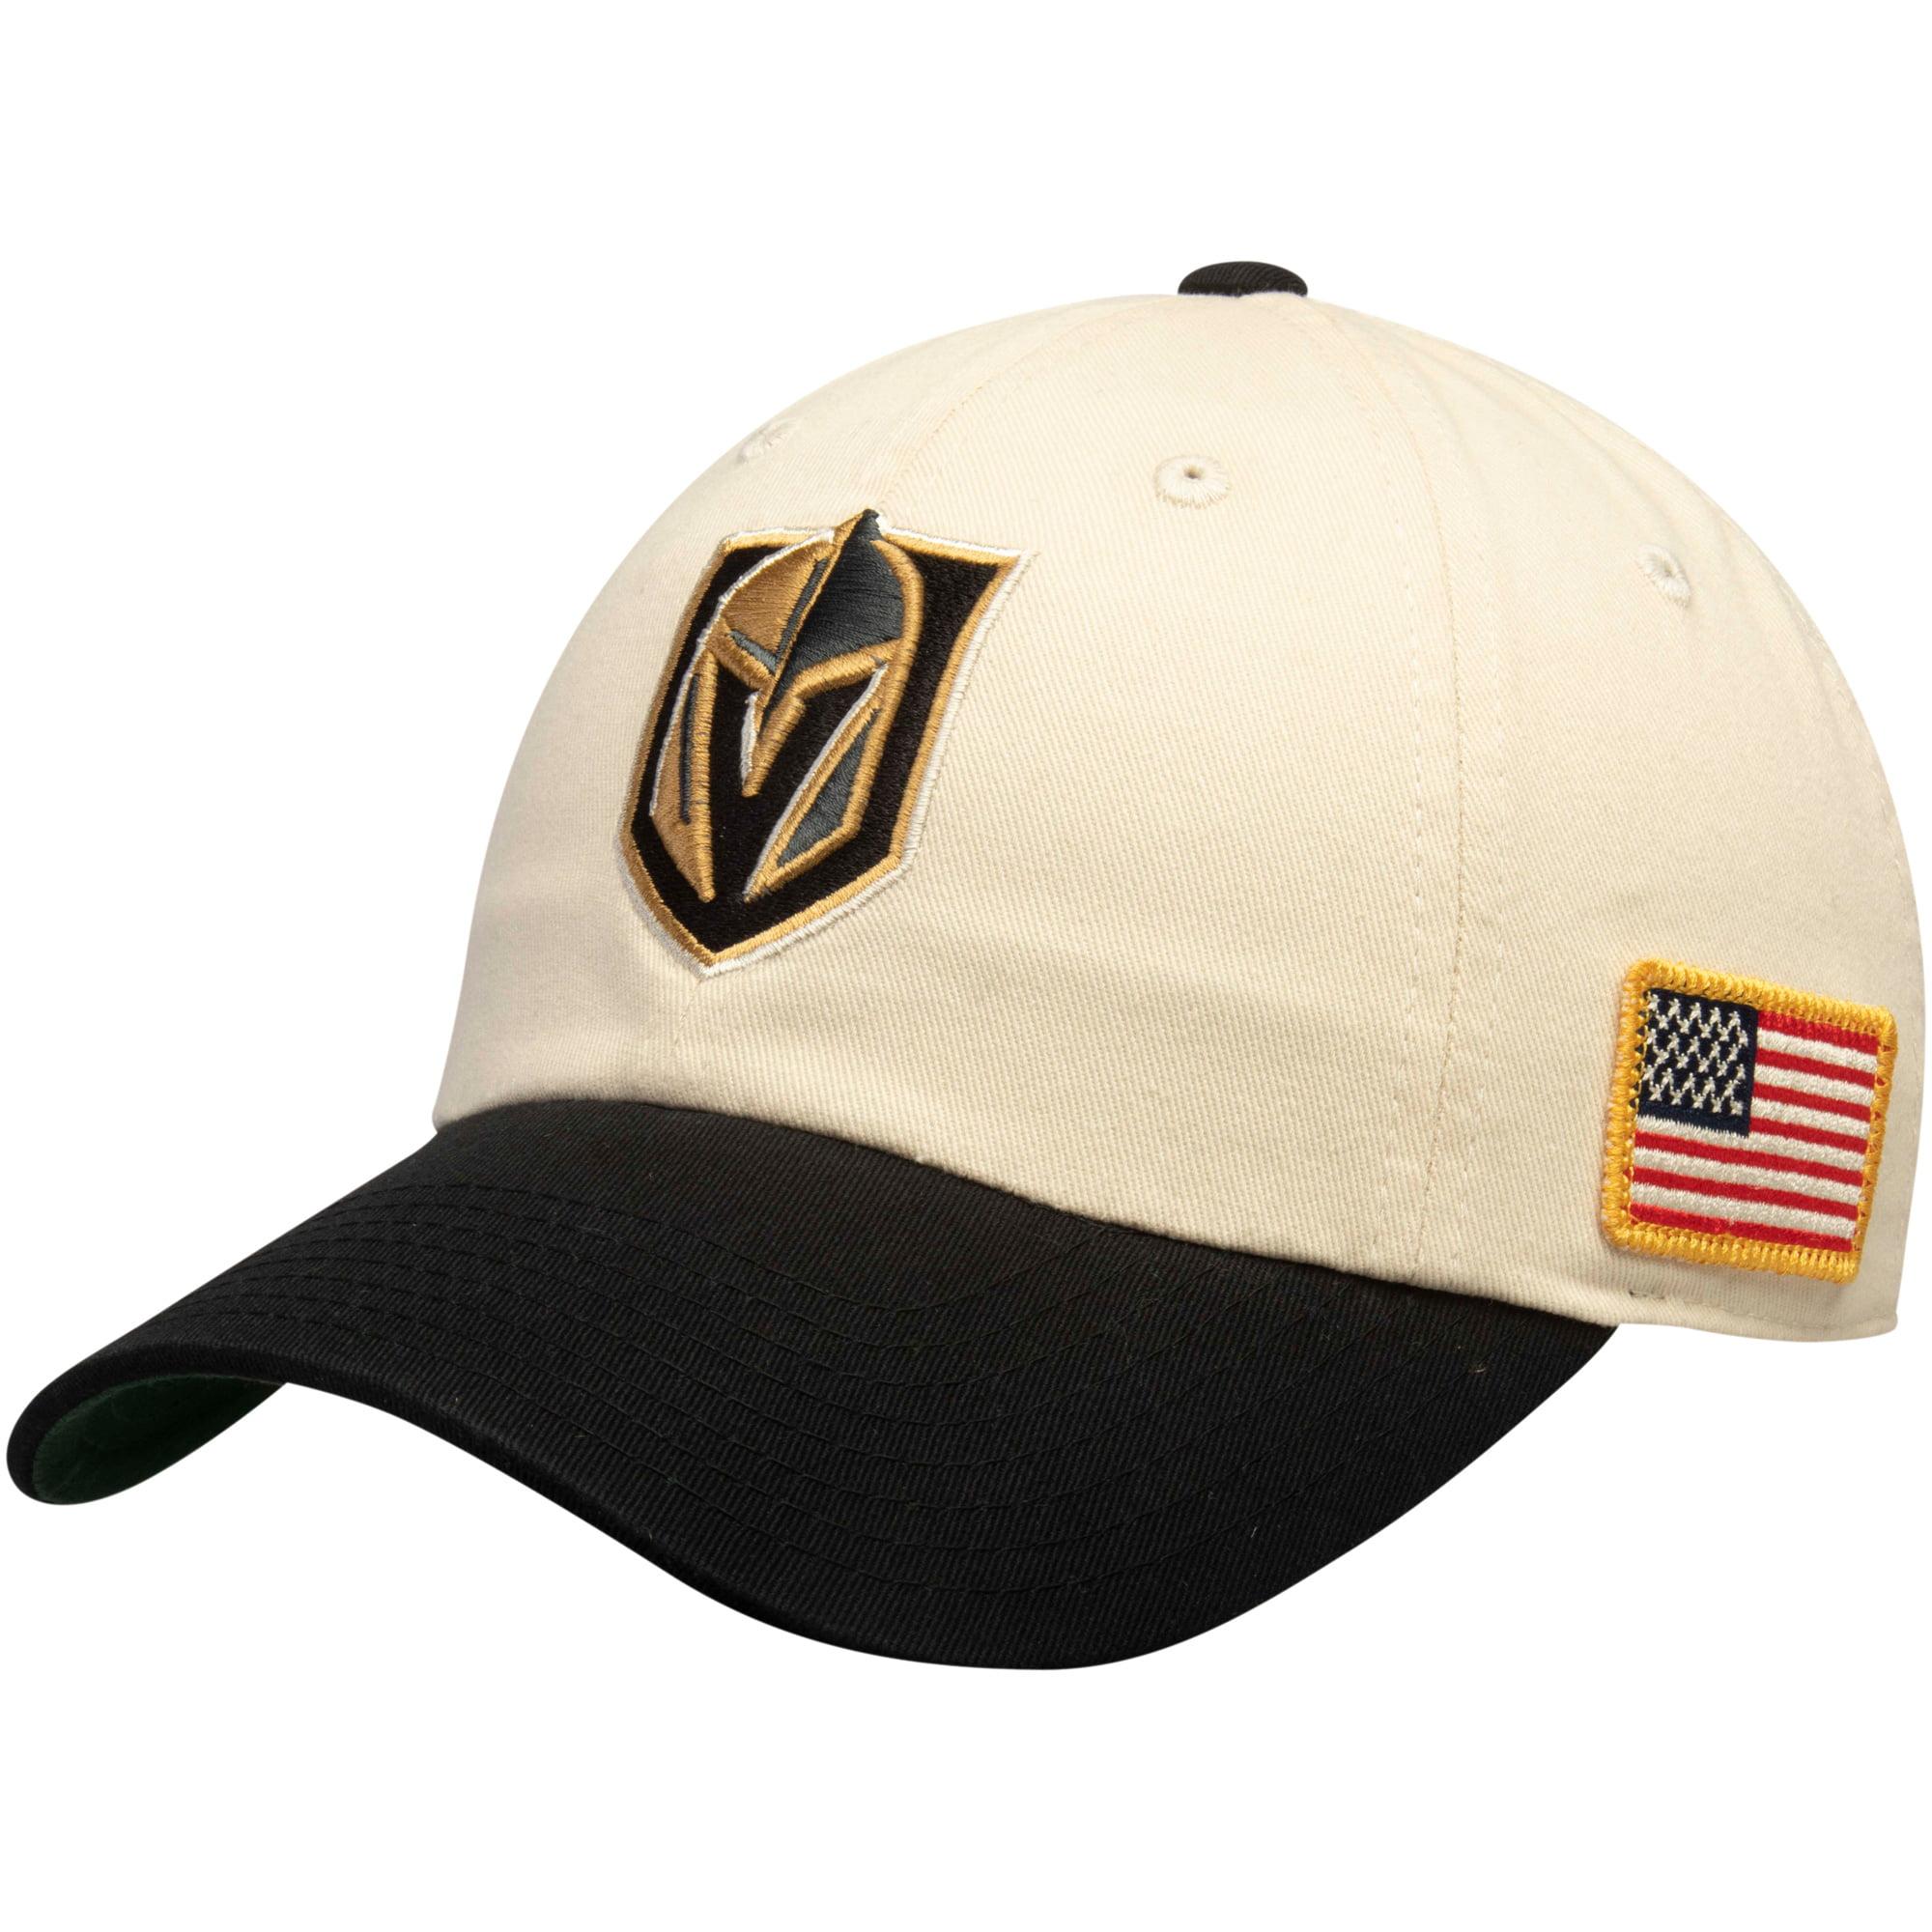 Vegas Golden Knights American Needle United Slouch Adjustable Hat - Cream/Black - OSFA